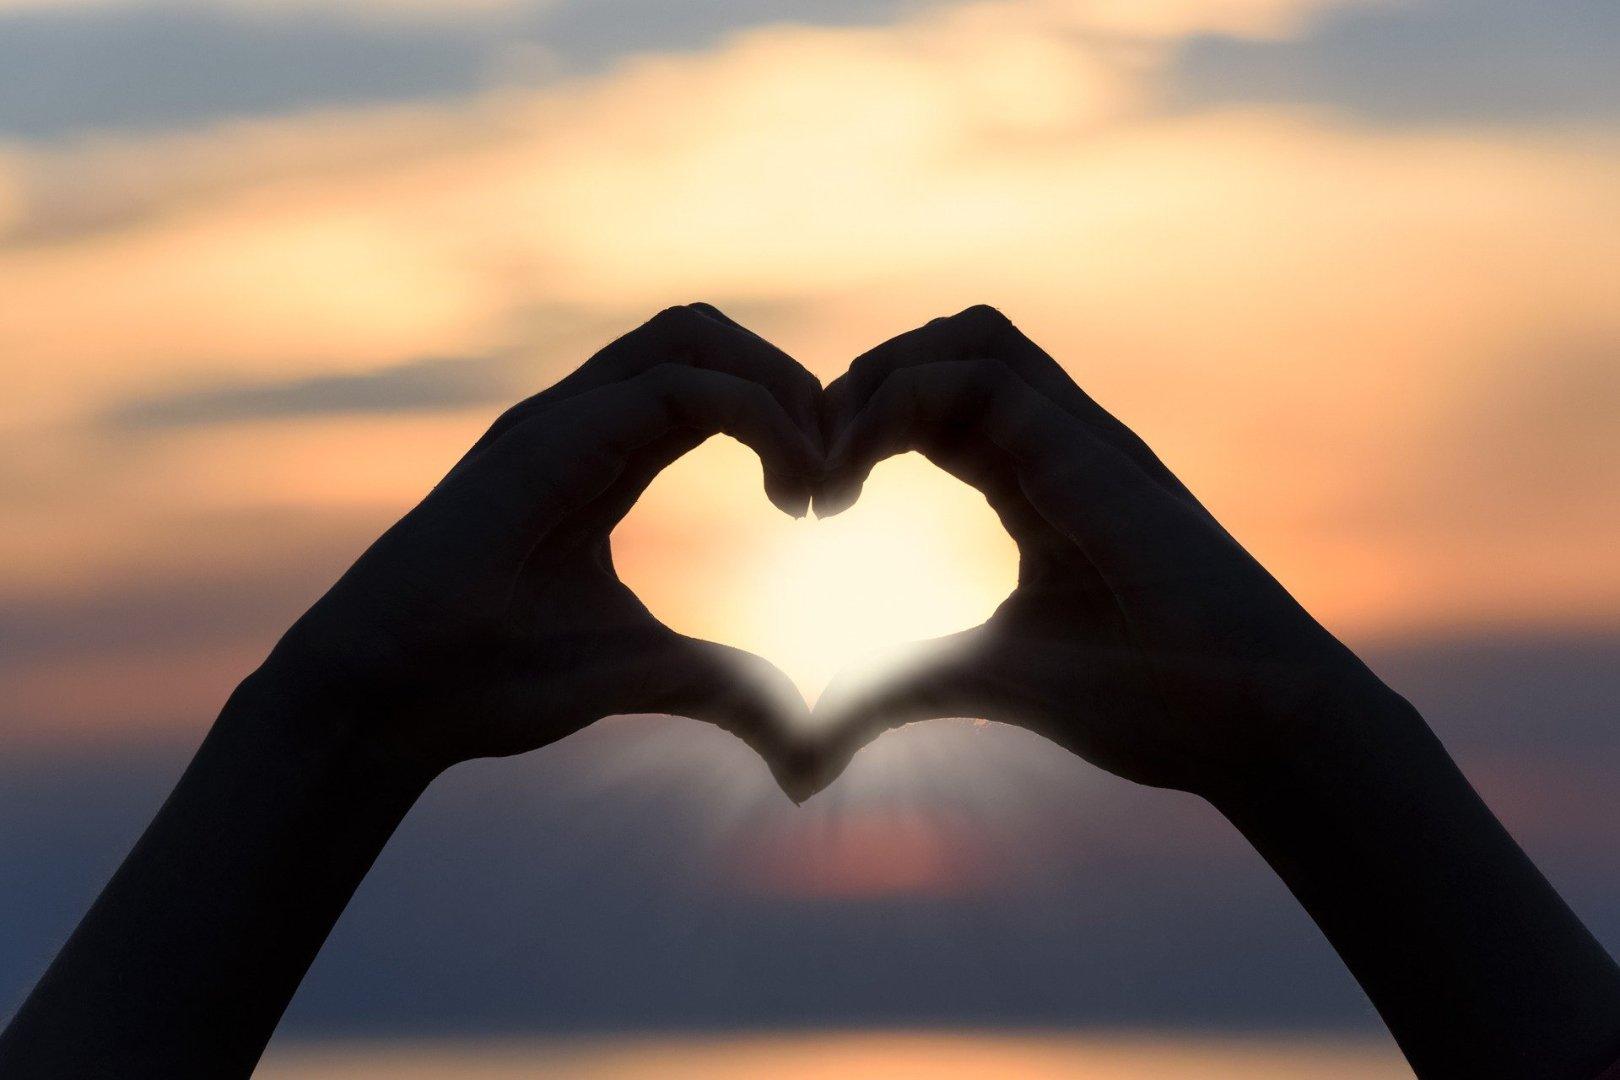 sunset viewed through 2 hands forming a heart